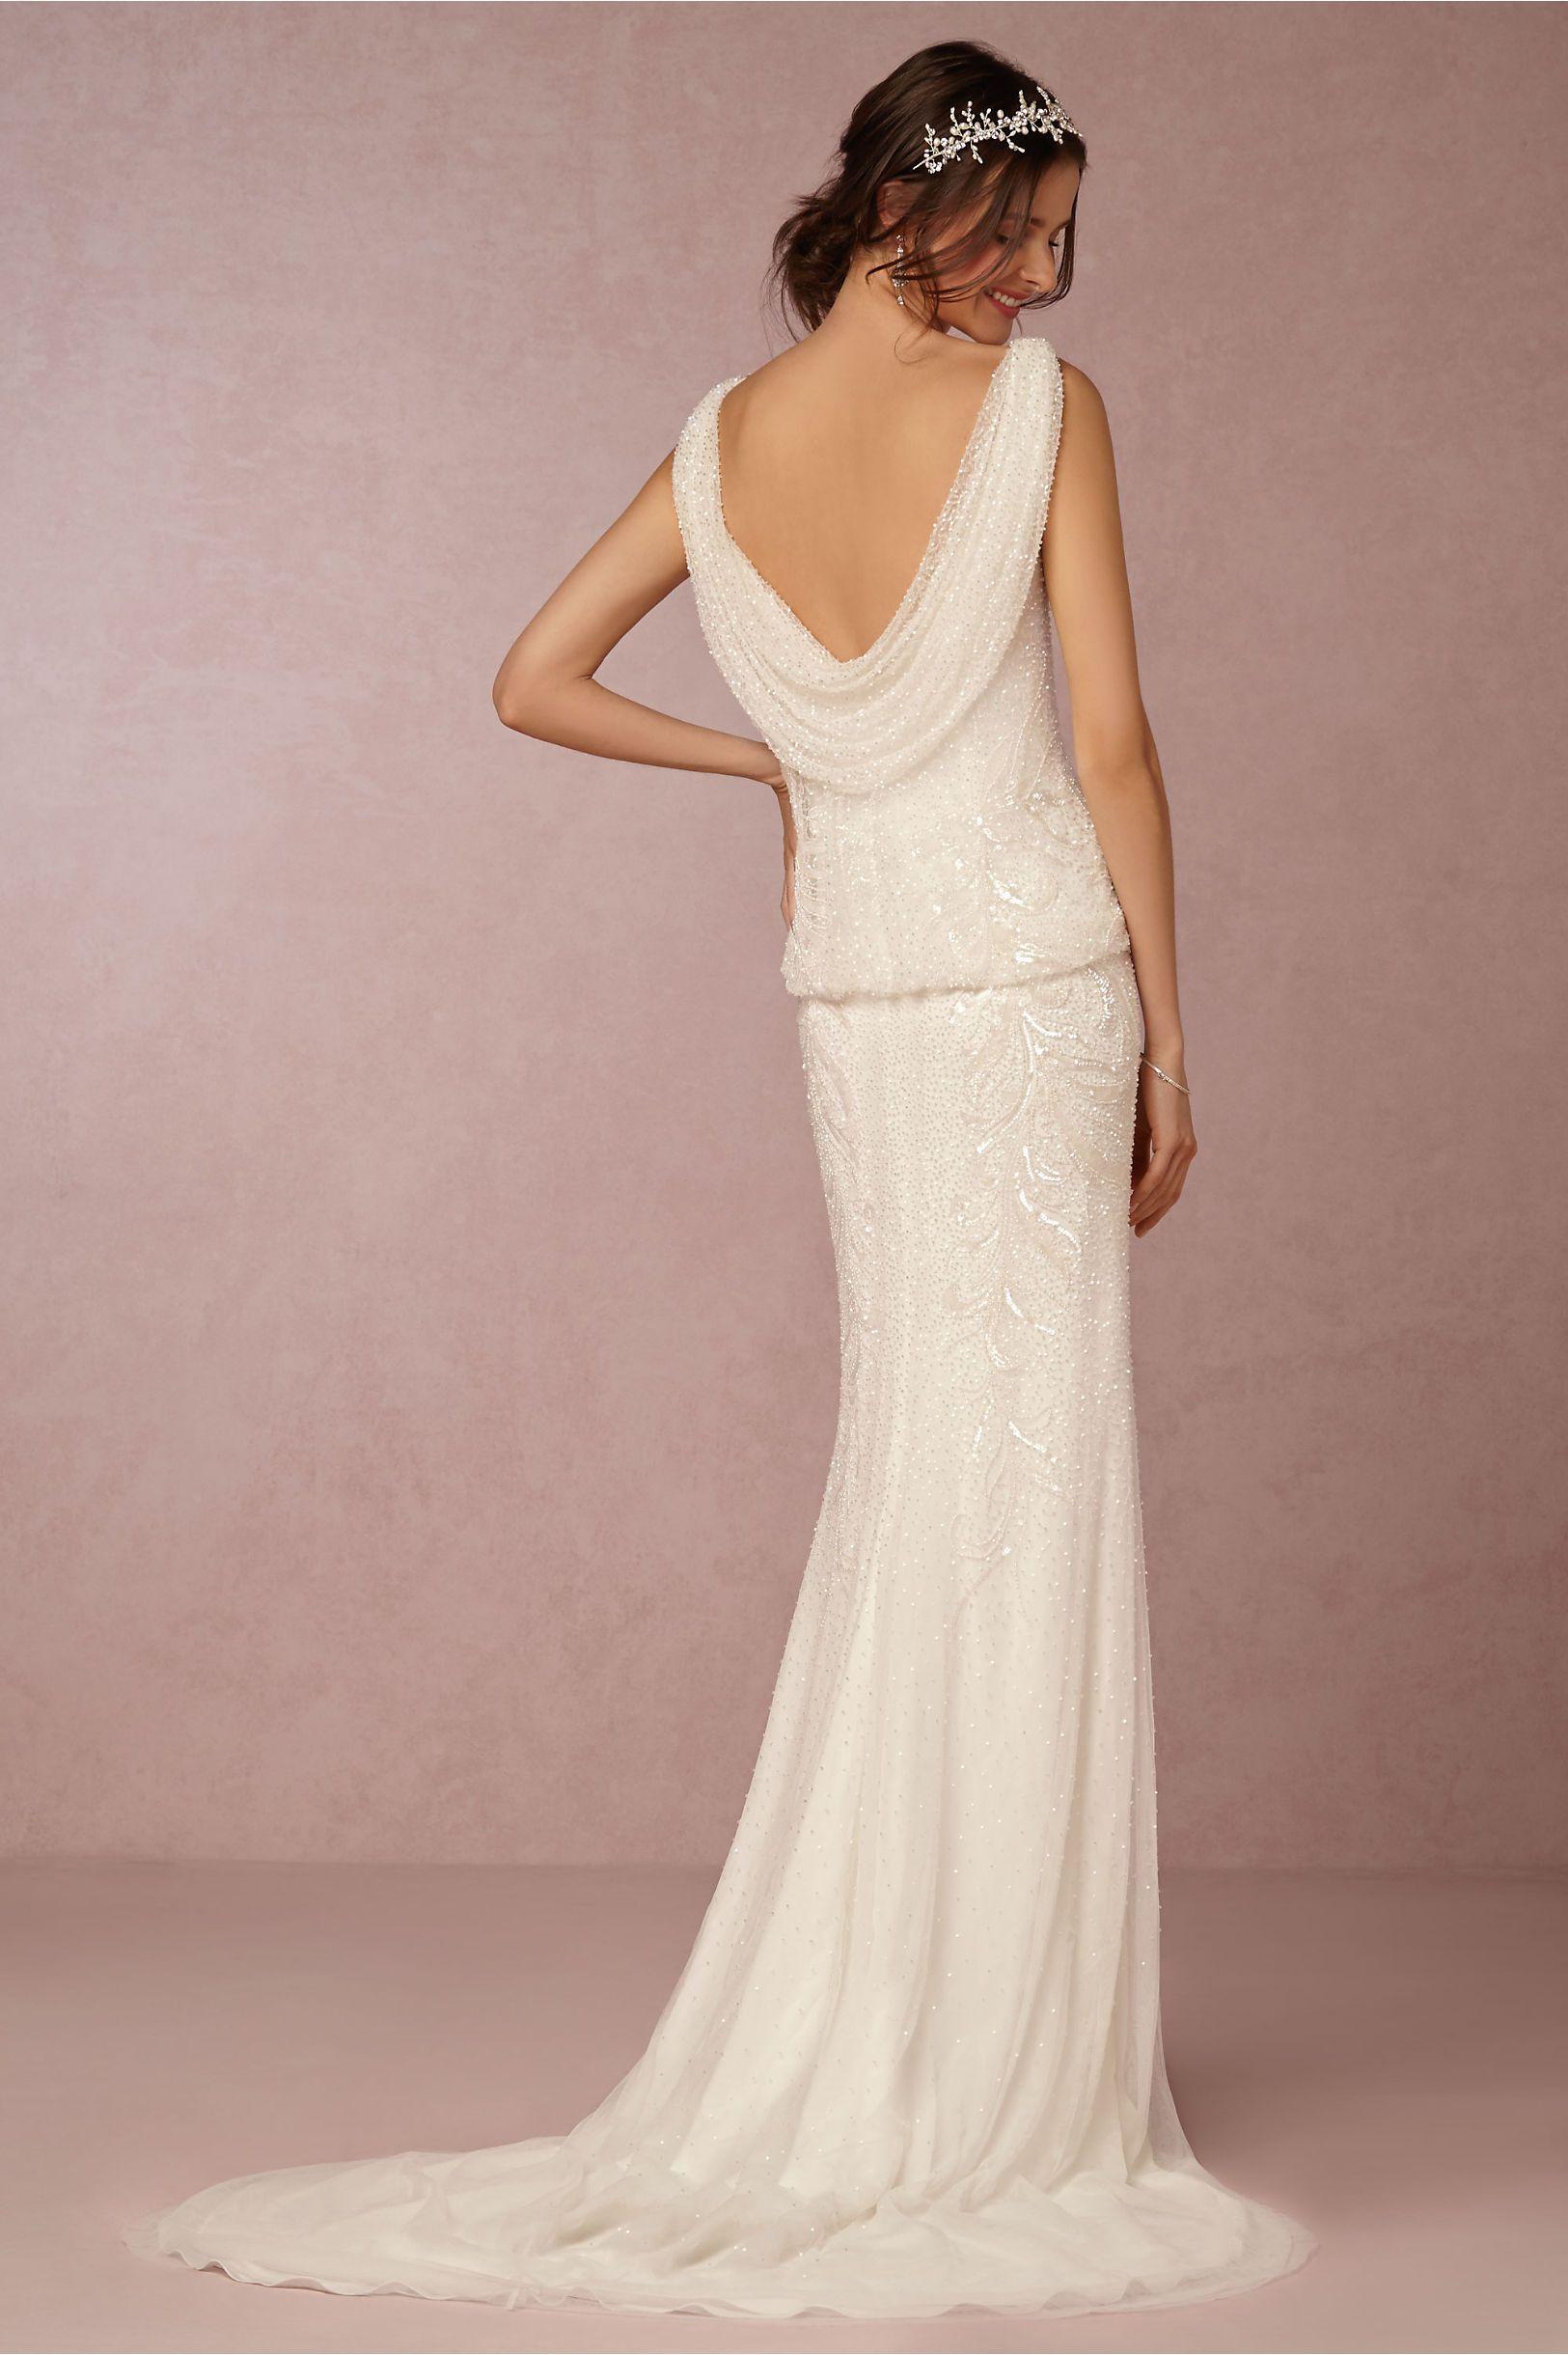 vintage-inspired gatsby wedding dress | Arabella Gown from BHLDN ...